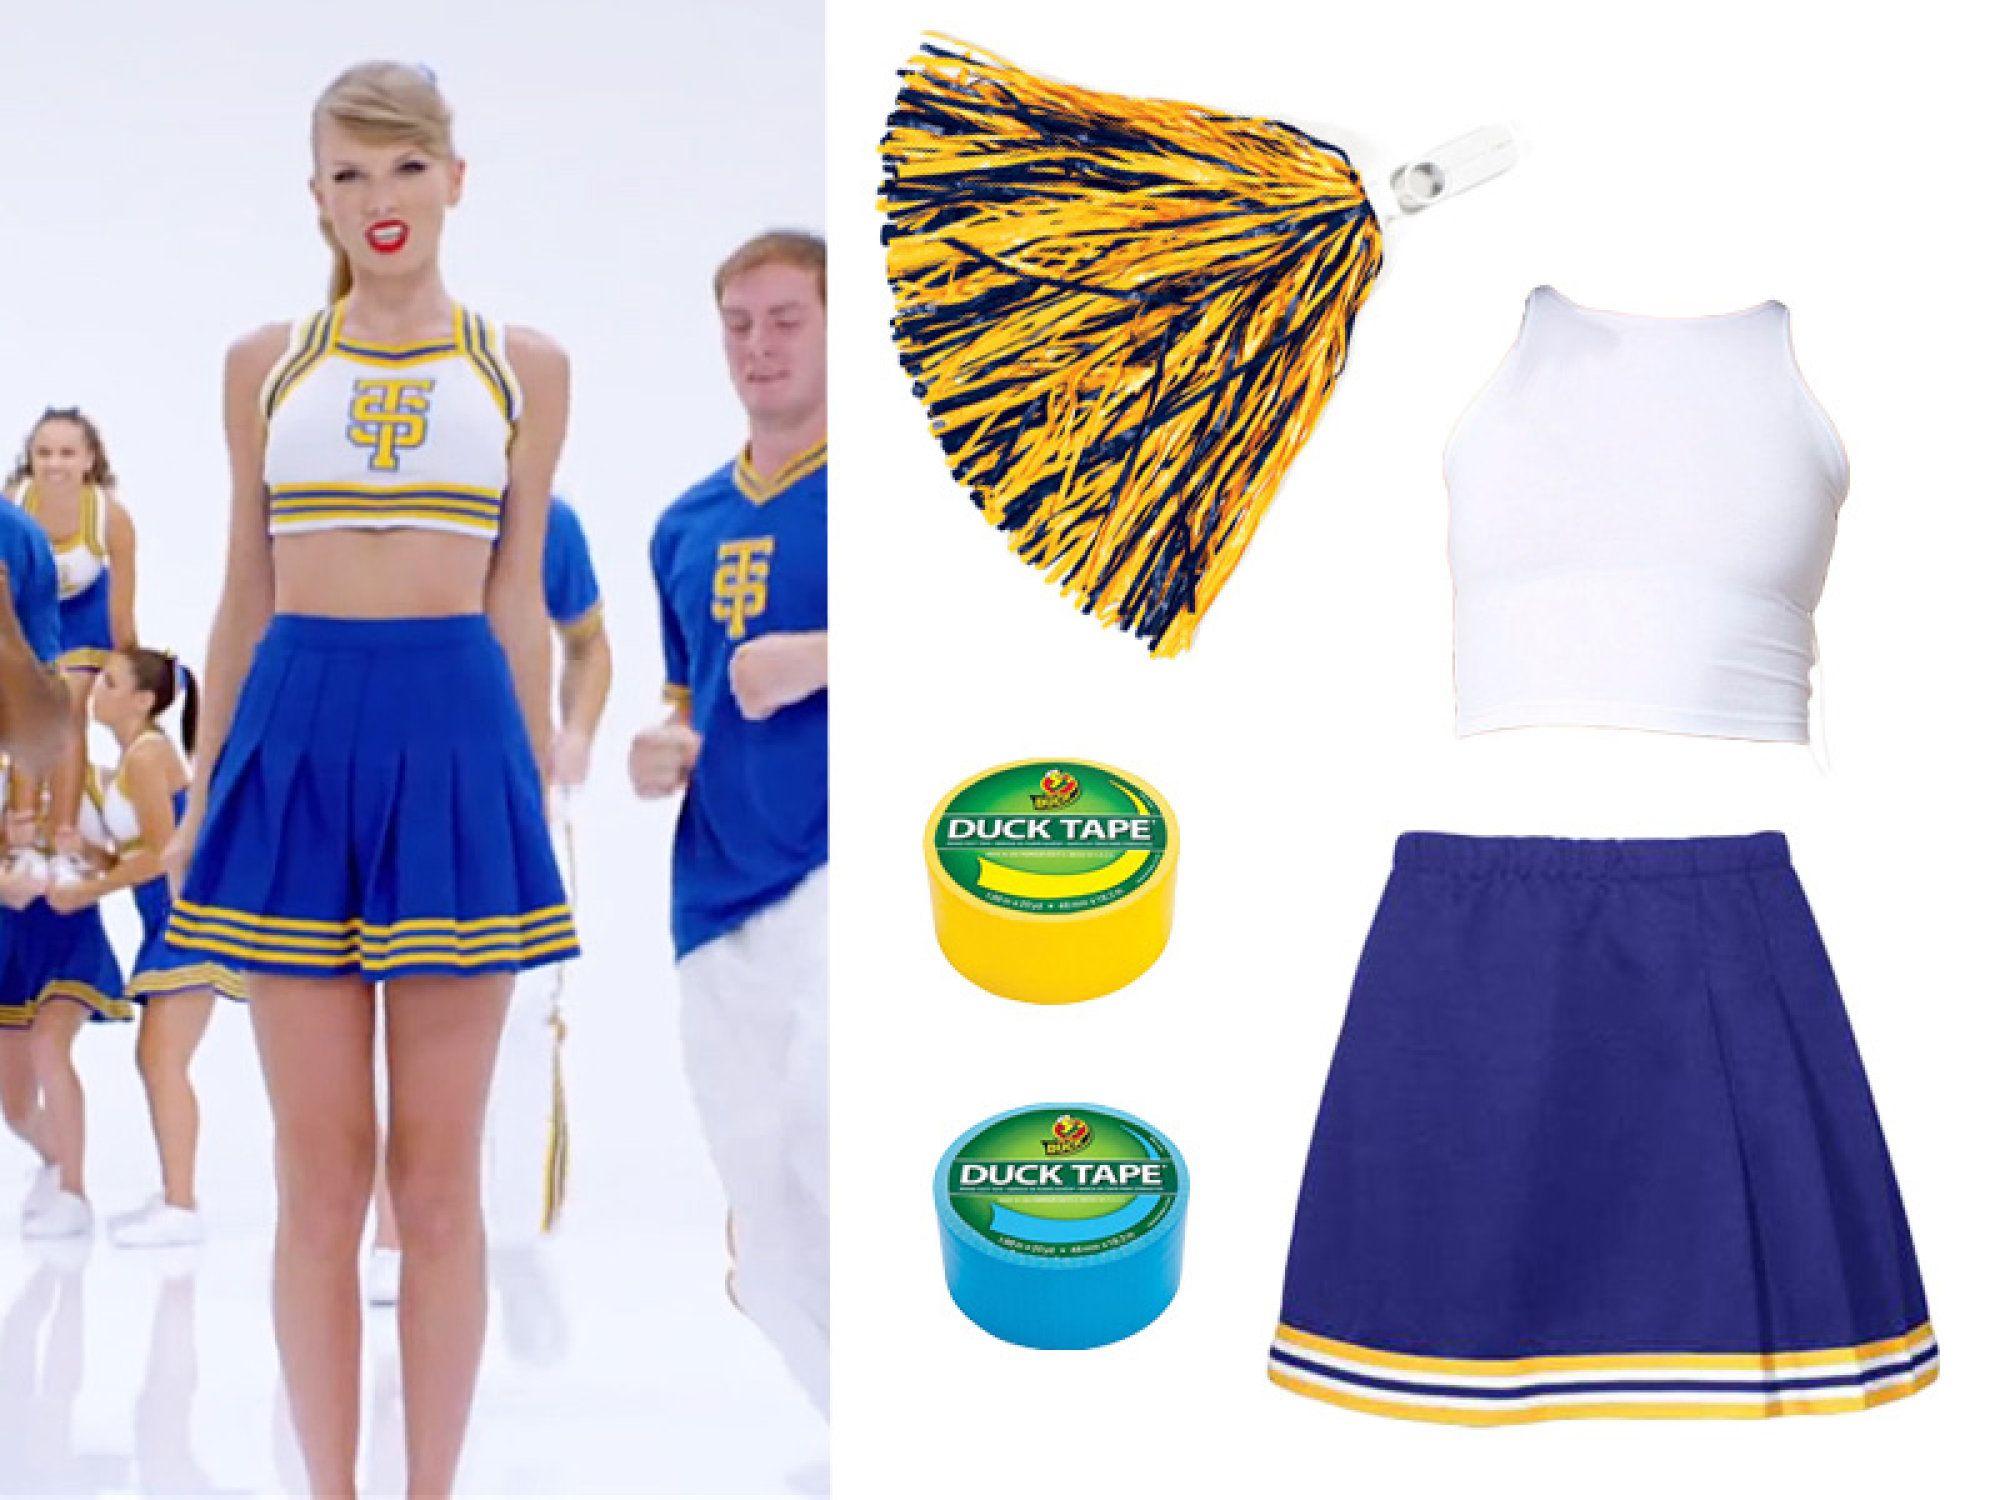 Taylor Swift Fans Cheerleaders - Google Search | Halloween ...